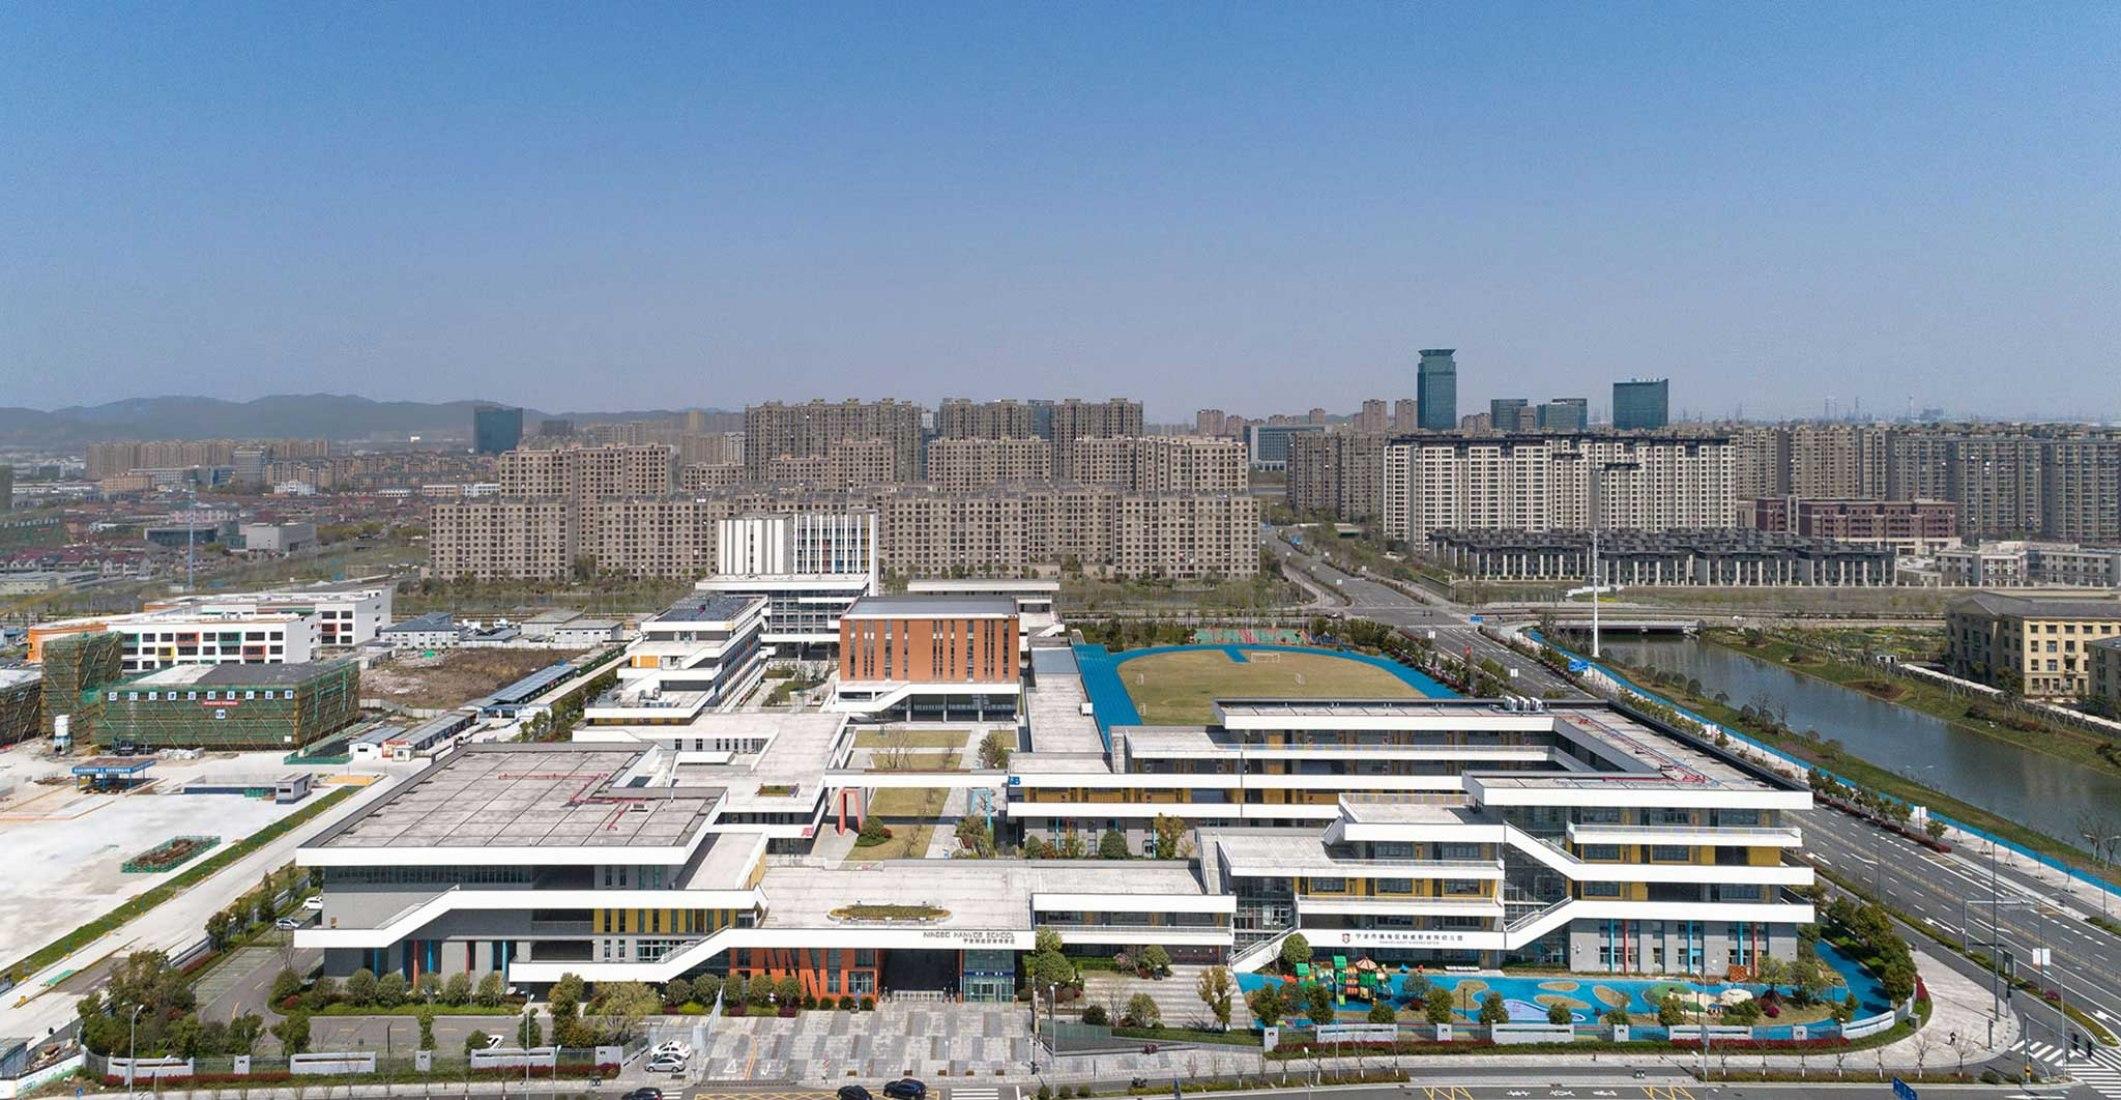 Escuela Ningbo Hanvos por DC Alliance. Fotografía por Liu Yang, Xing Zhi Ying Xiang